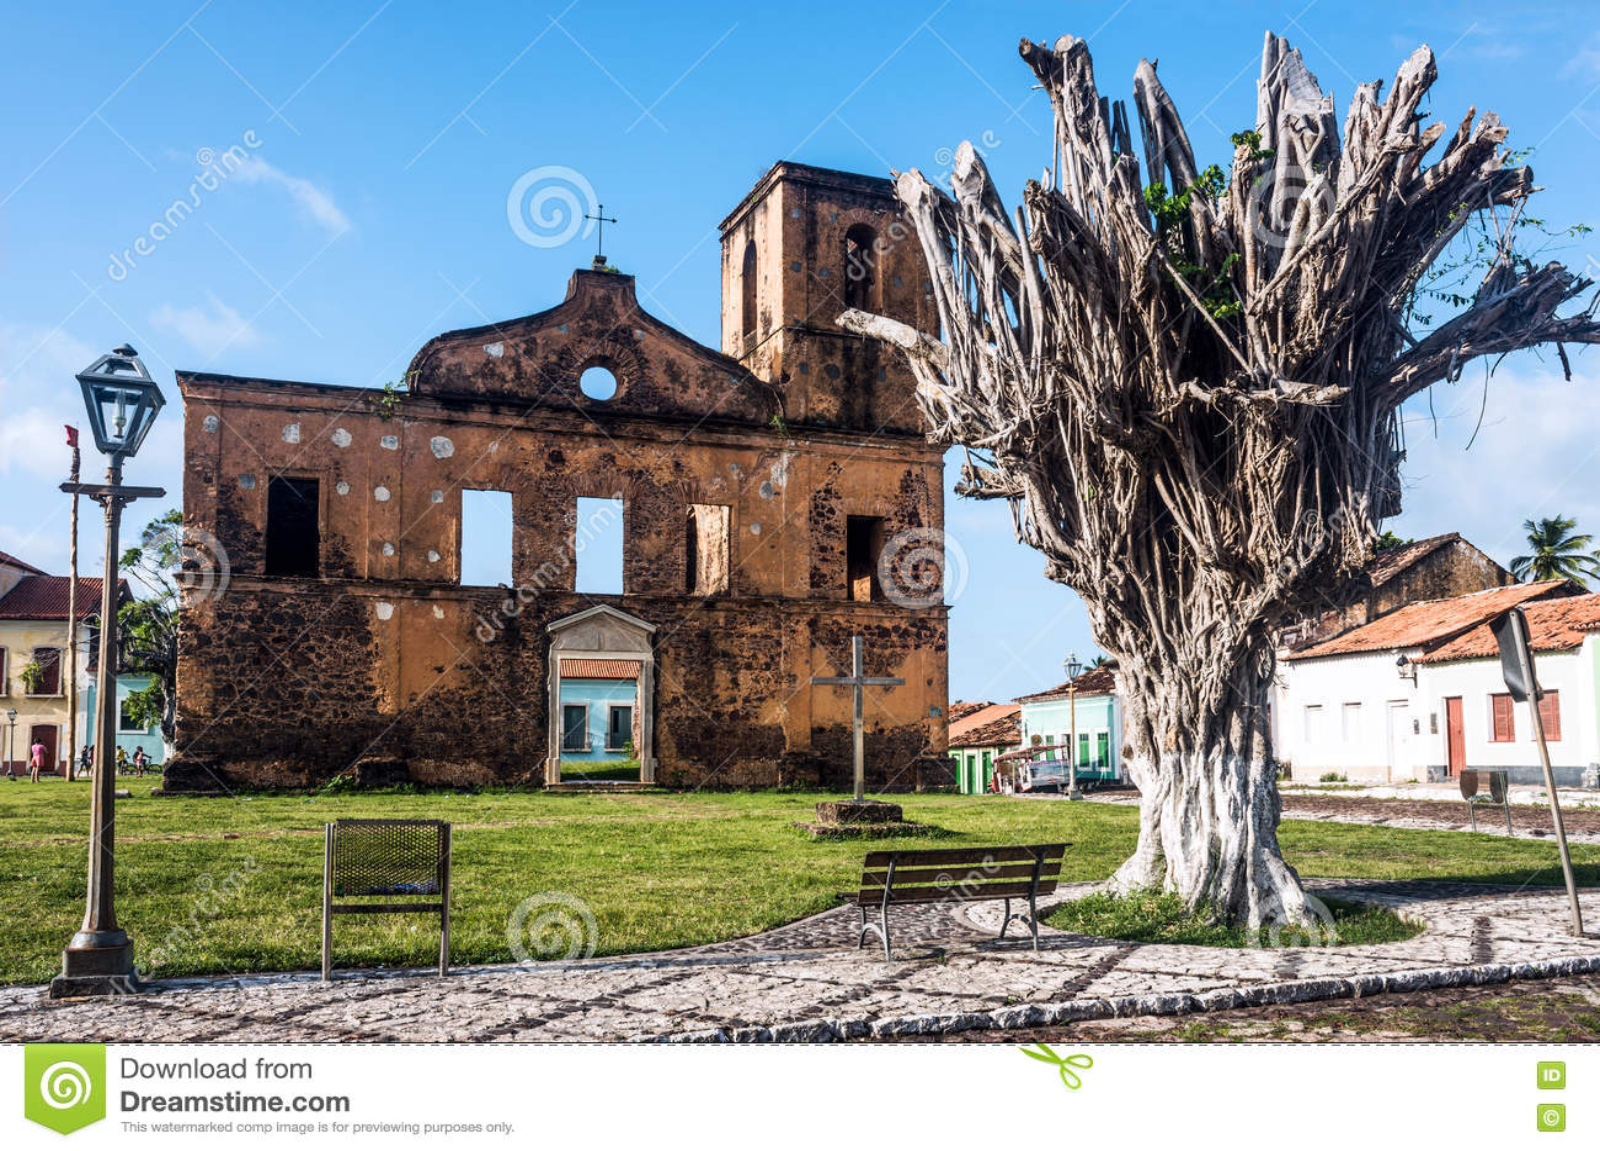 Matriz Church ruins in the historic city of Alcantara